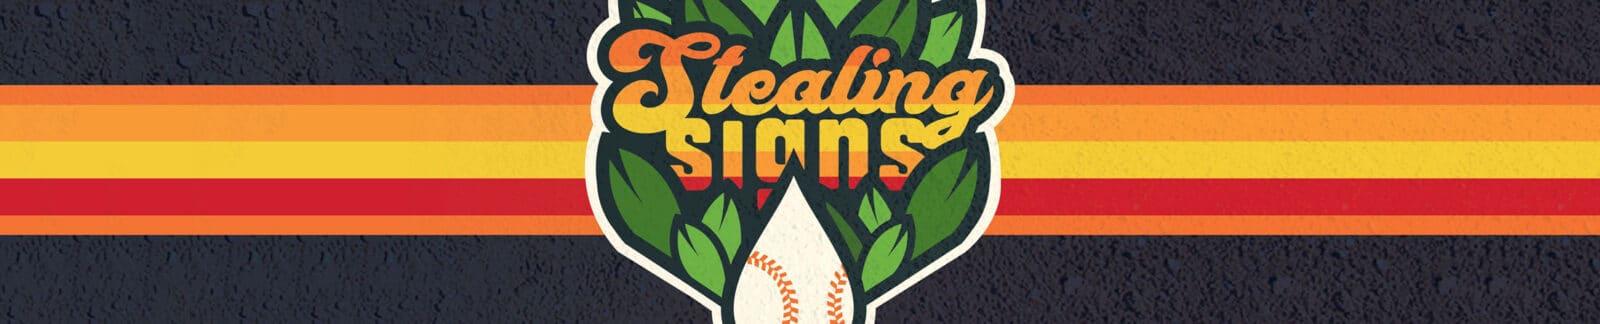 Stealing Signs IPA header